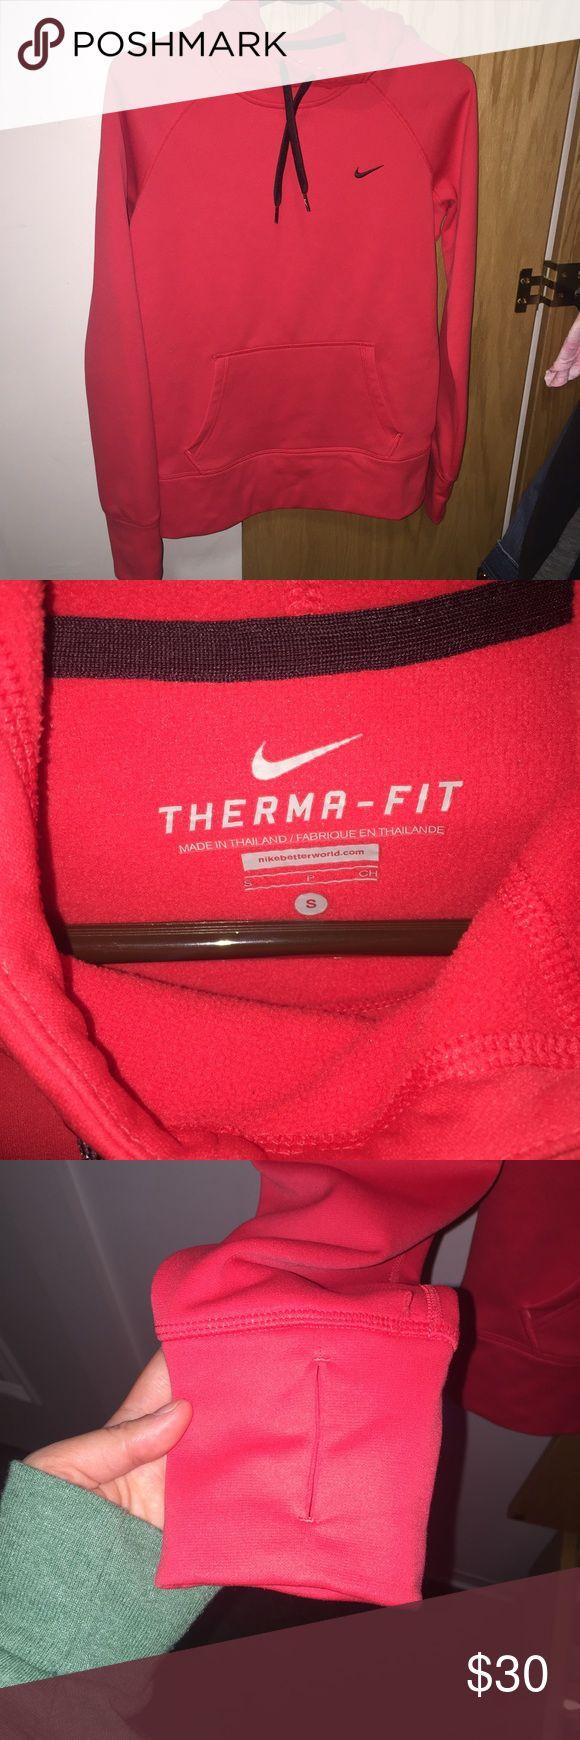 ❄️SOLD❄️Coral Nike Fleece Hoodie Nike. Therma Fit Hoodie. Fleece Inside. Super Warm. Worn Twice. Lowest Will Be $25 Nike Jackets & Coats